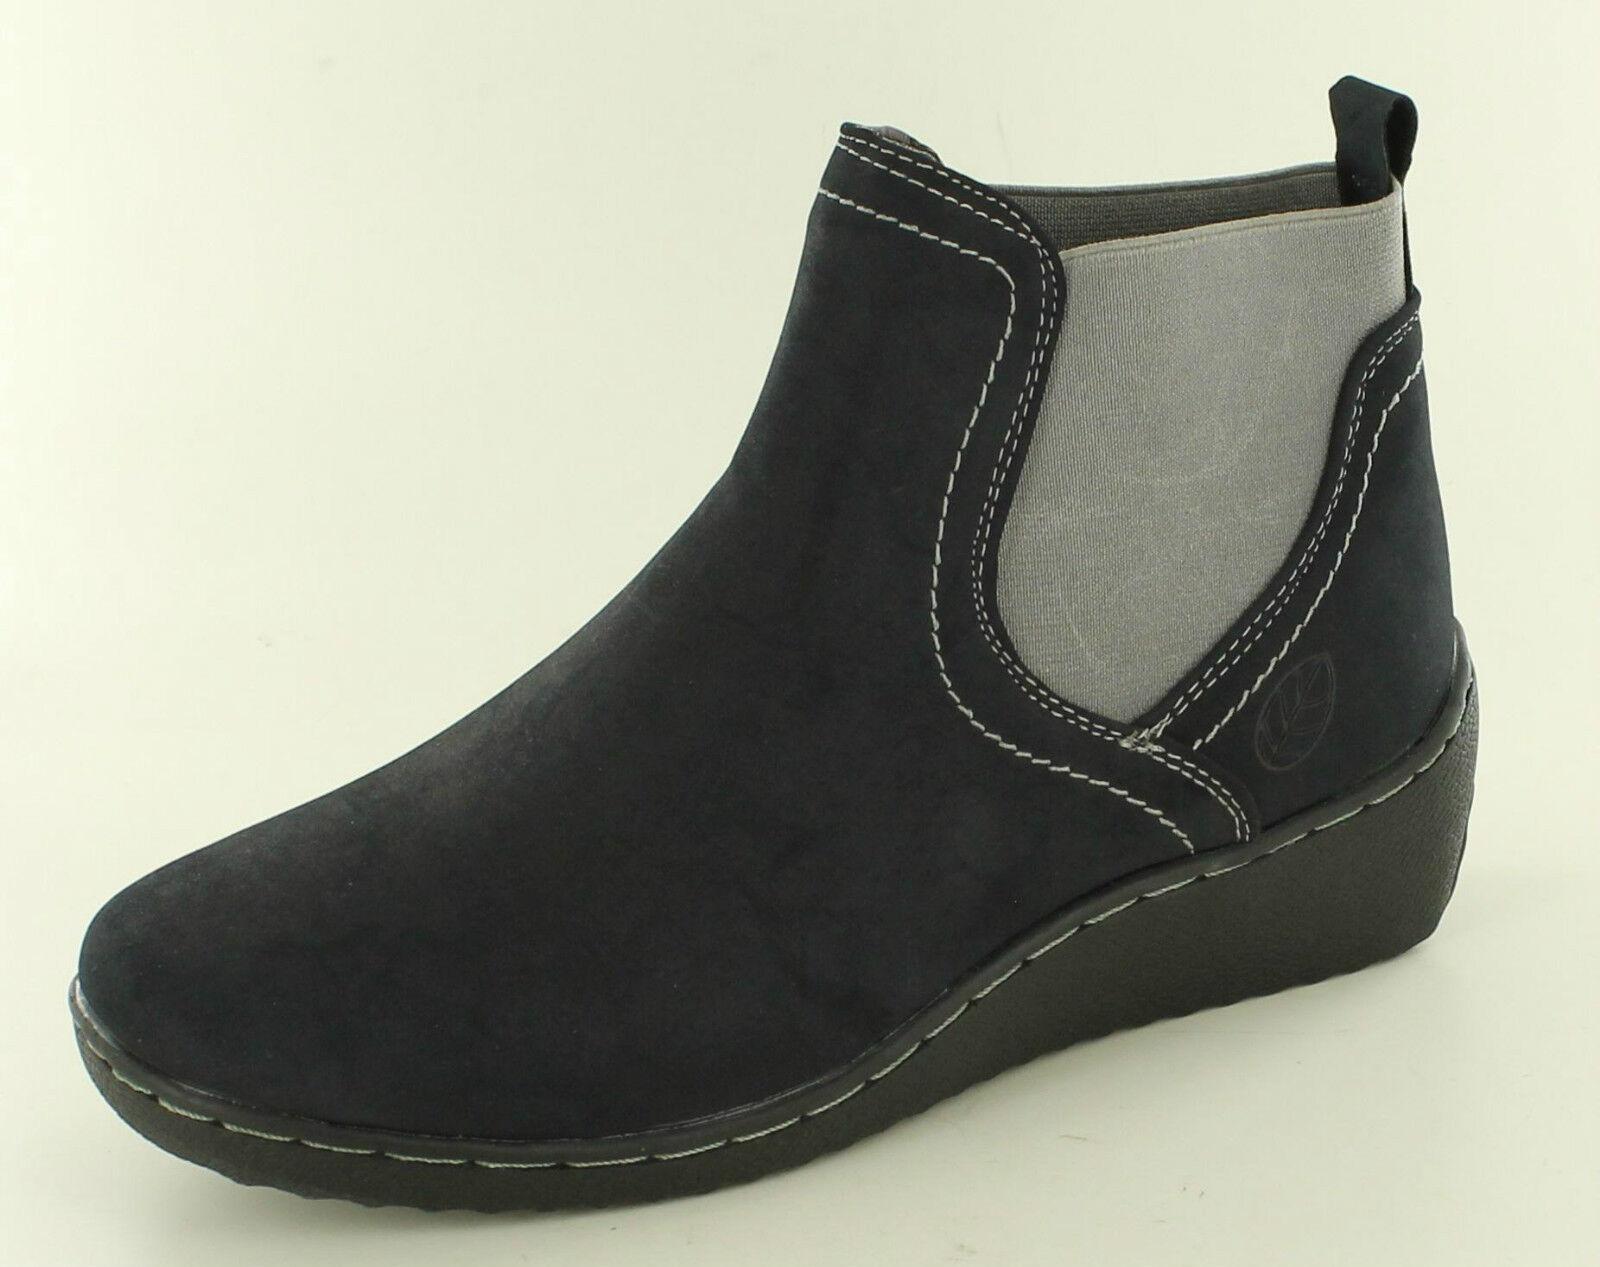 Natrelle Hawk Slip On Ankle Boots Black